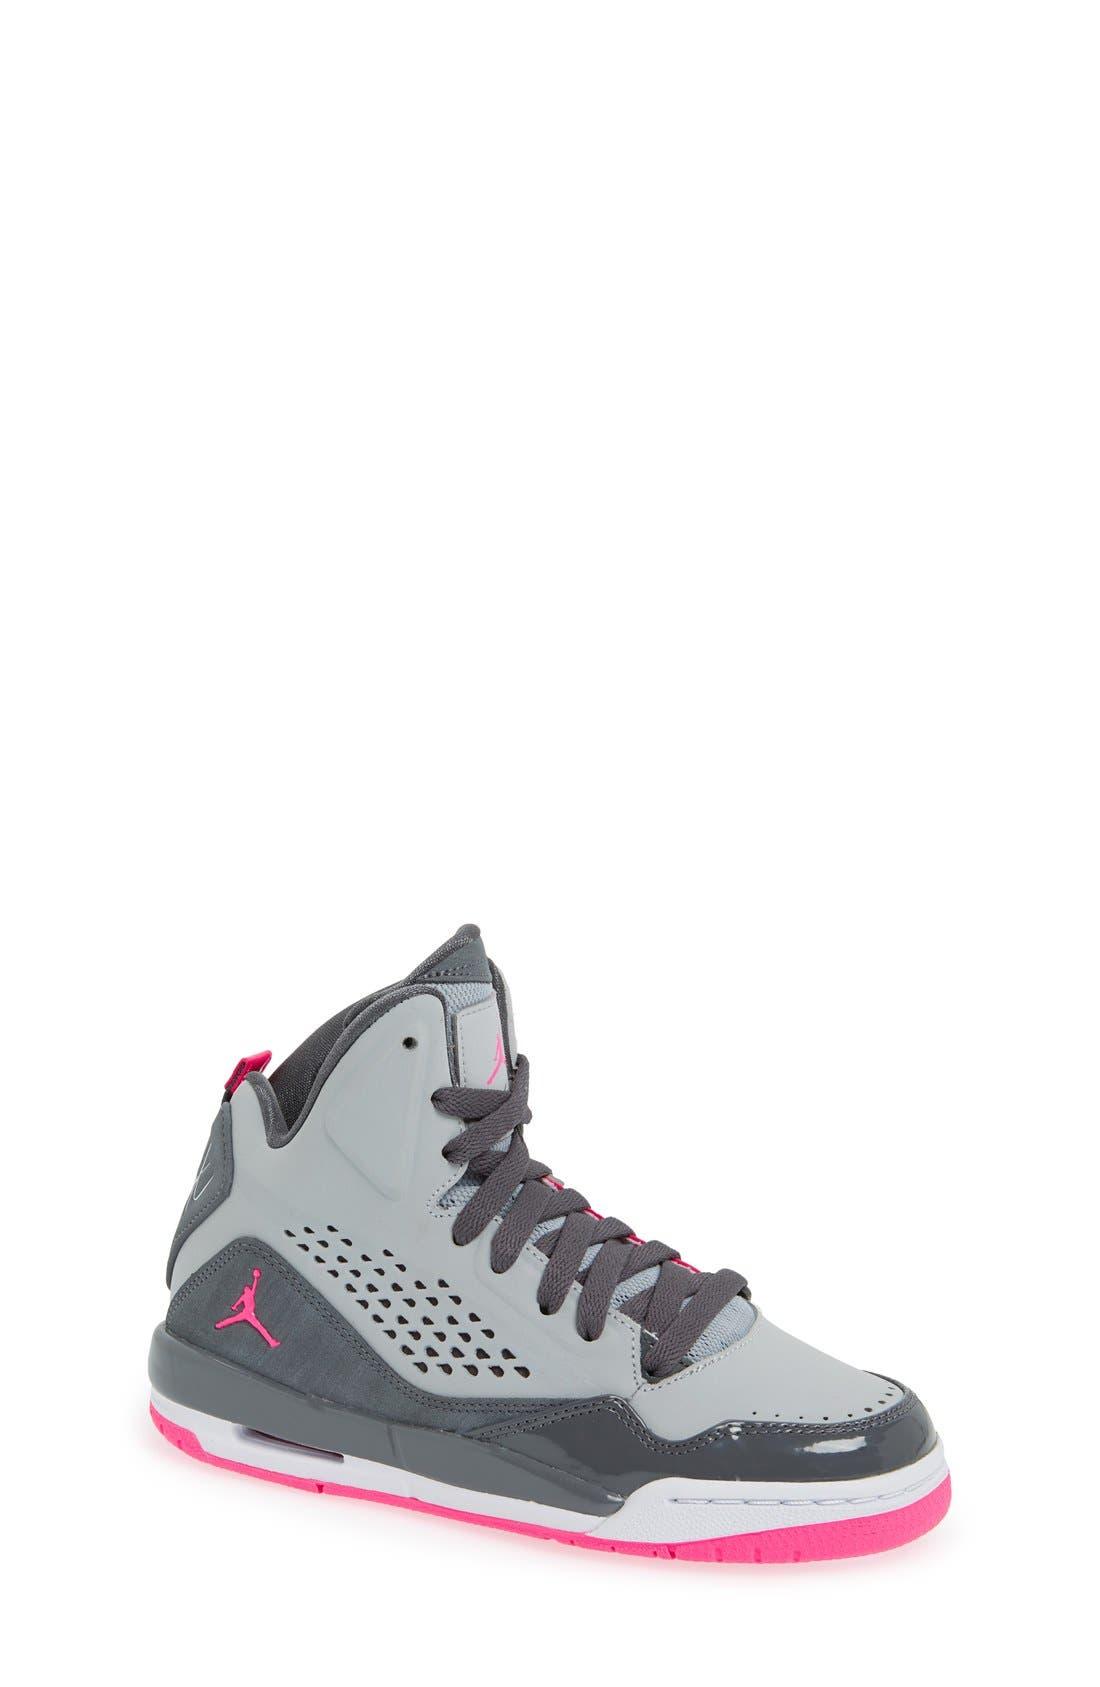 Main Image - Nike 'Jordan SC3' Basketball Shoe (Big Kid)